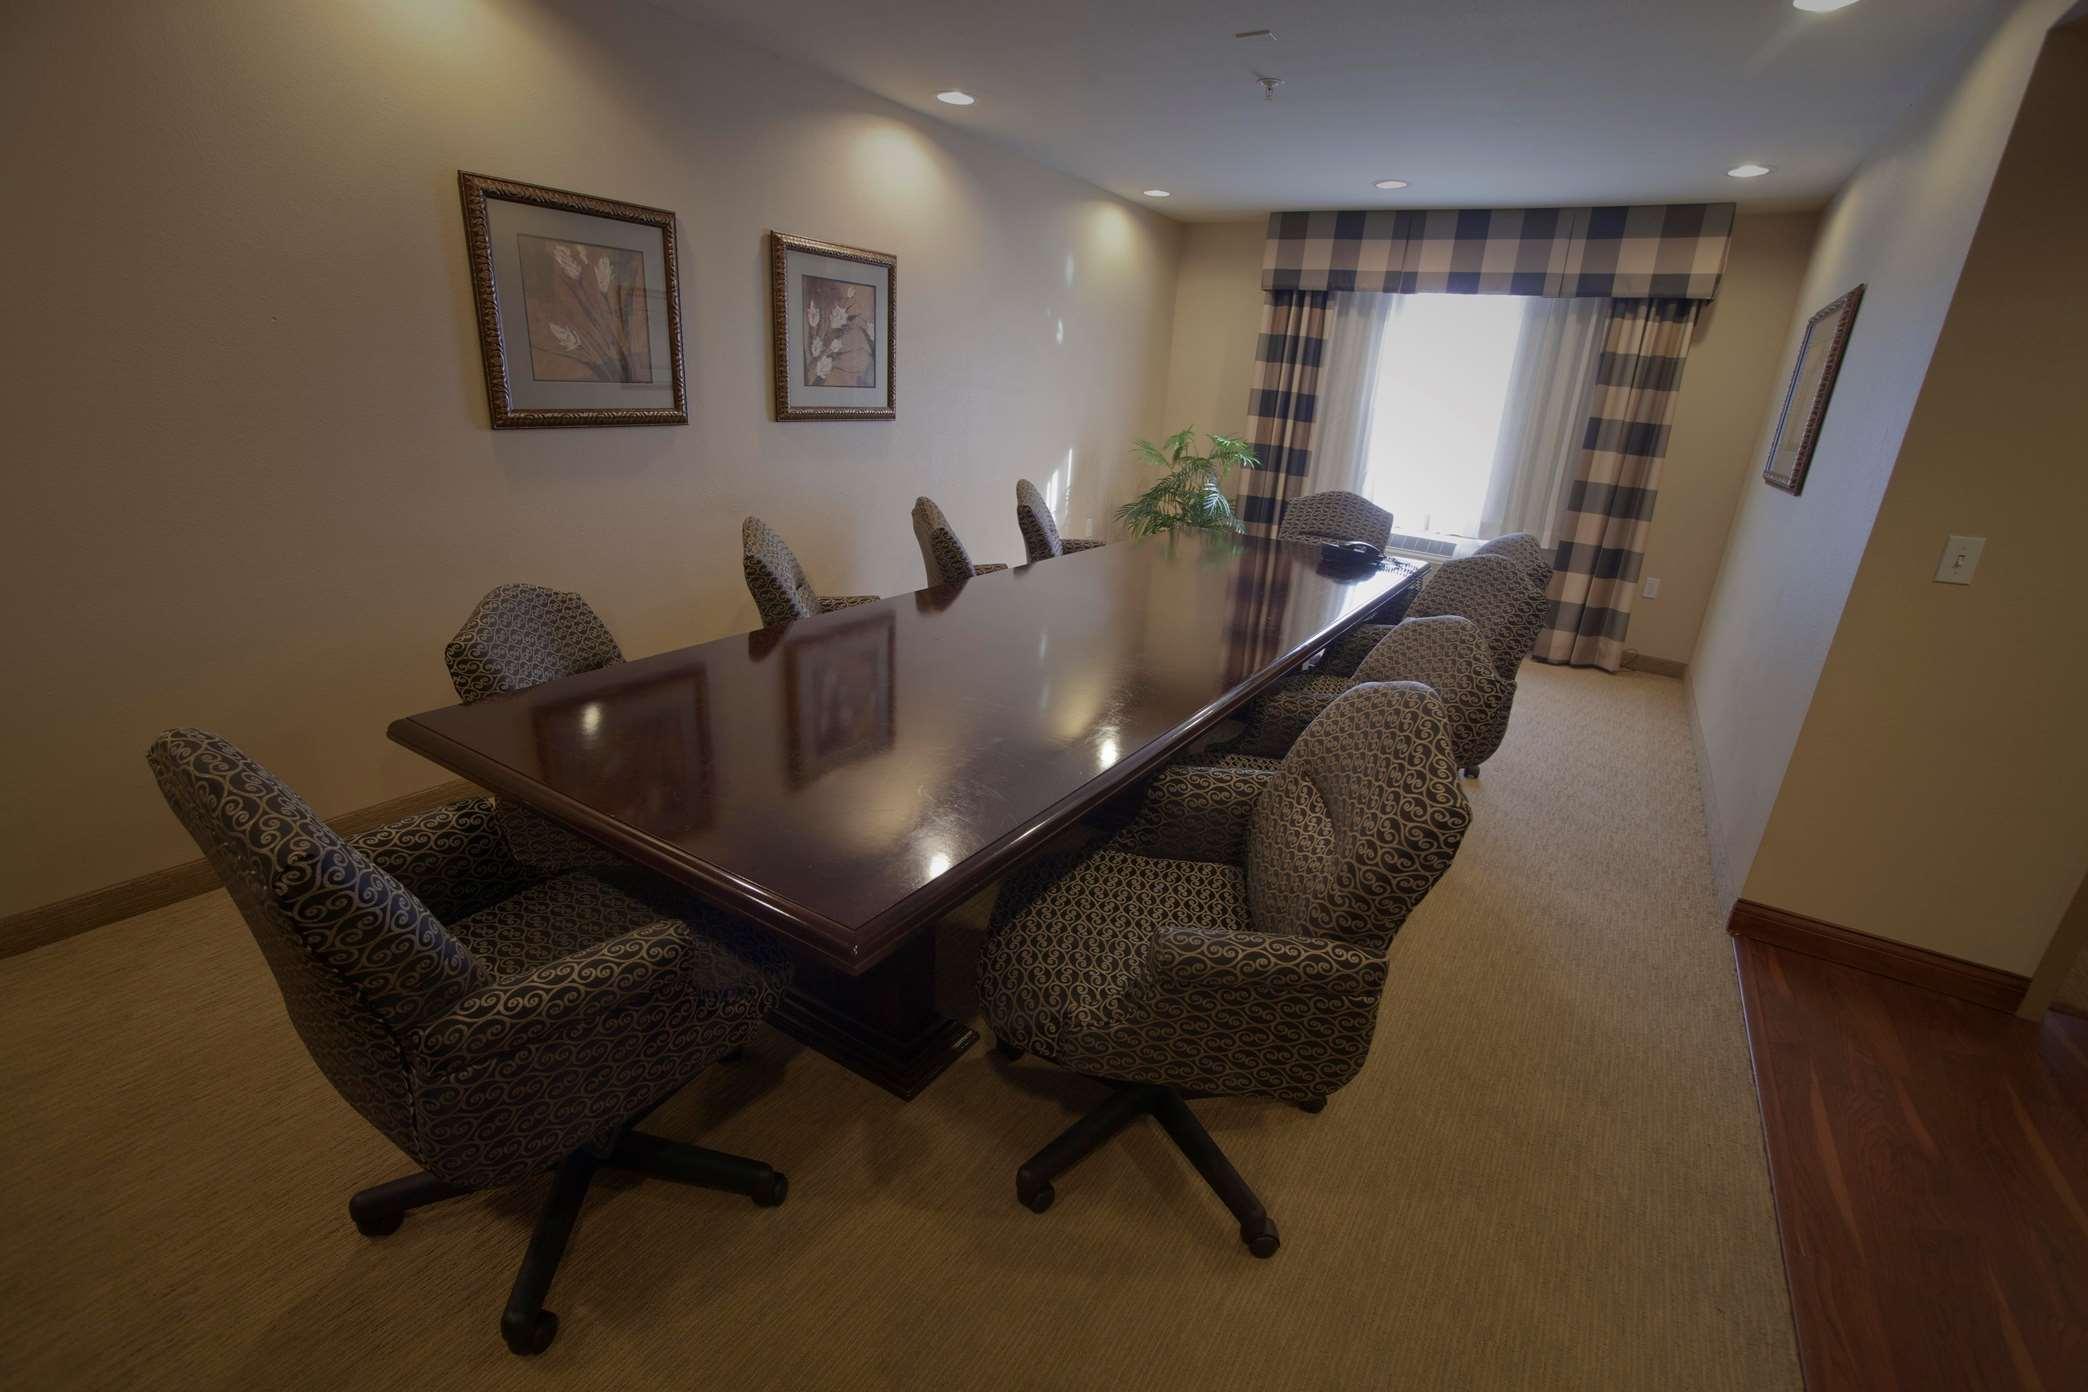 Homewood Suites by Hilton Albuquerque Airport image 7